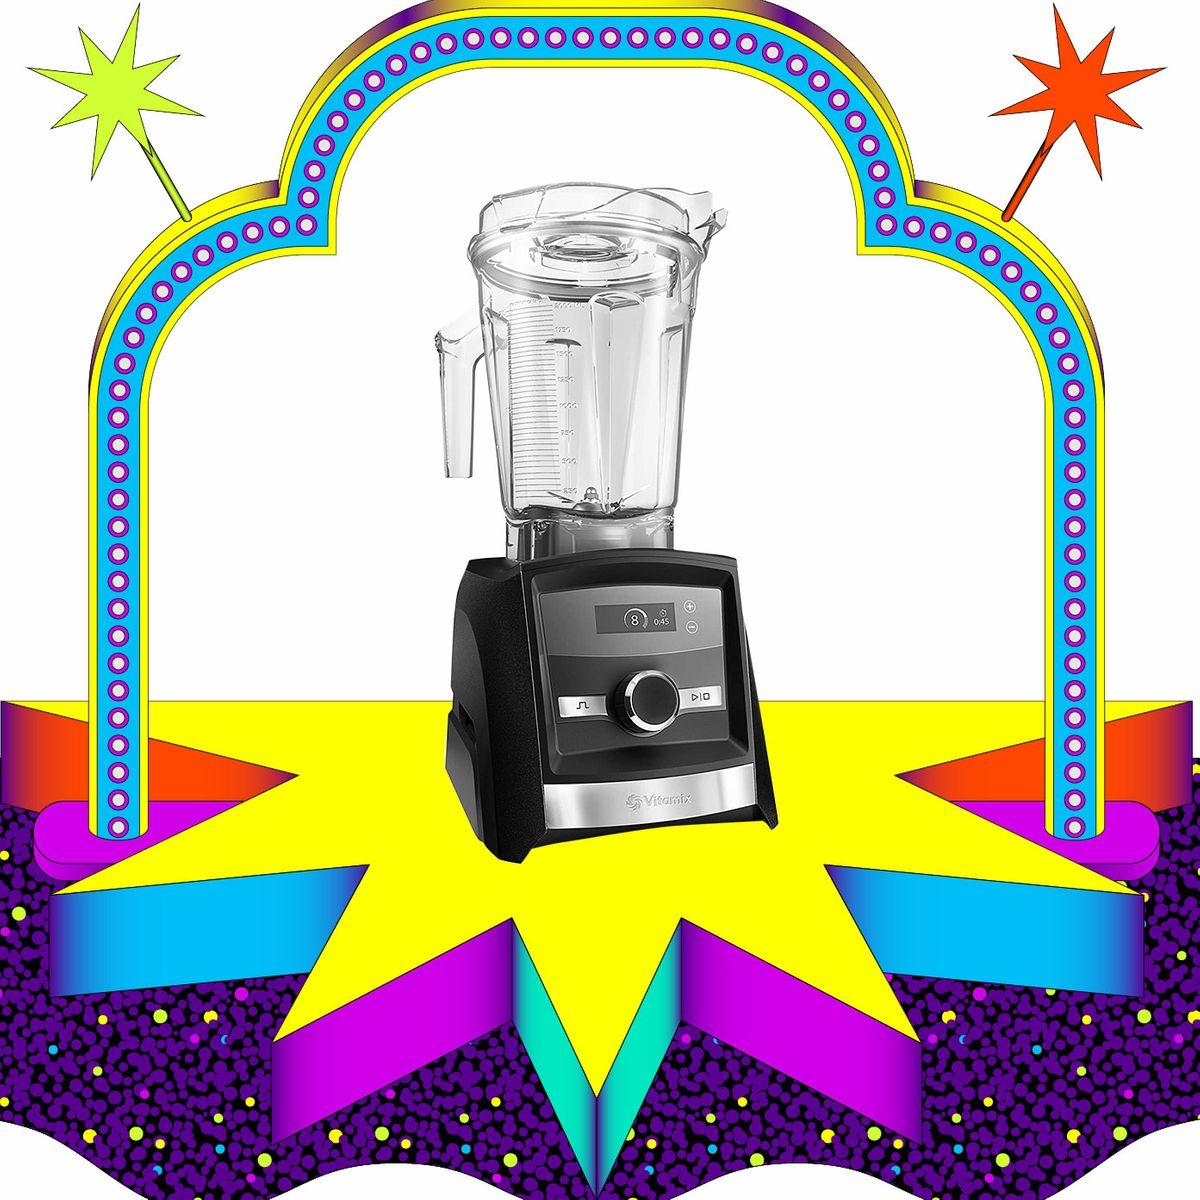 Vitamix Blender On Sale For Amazon Prime Day 2020 The Strategist New York Magazine